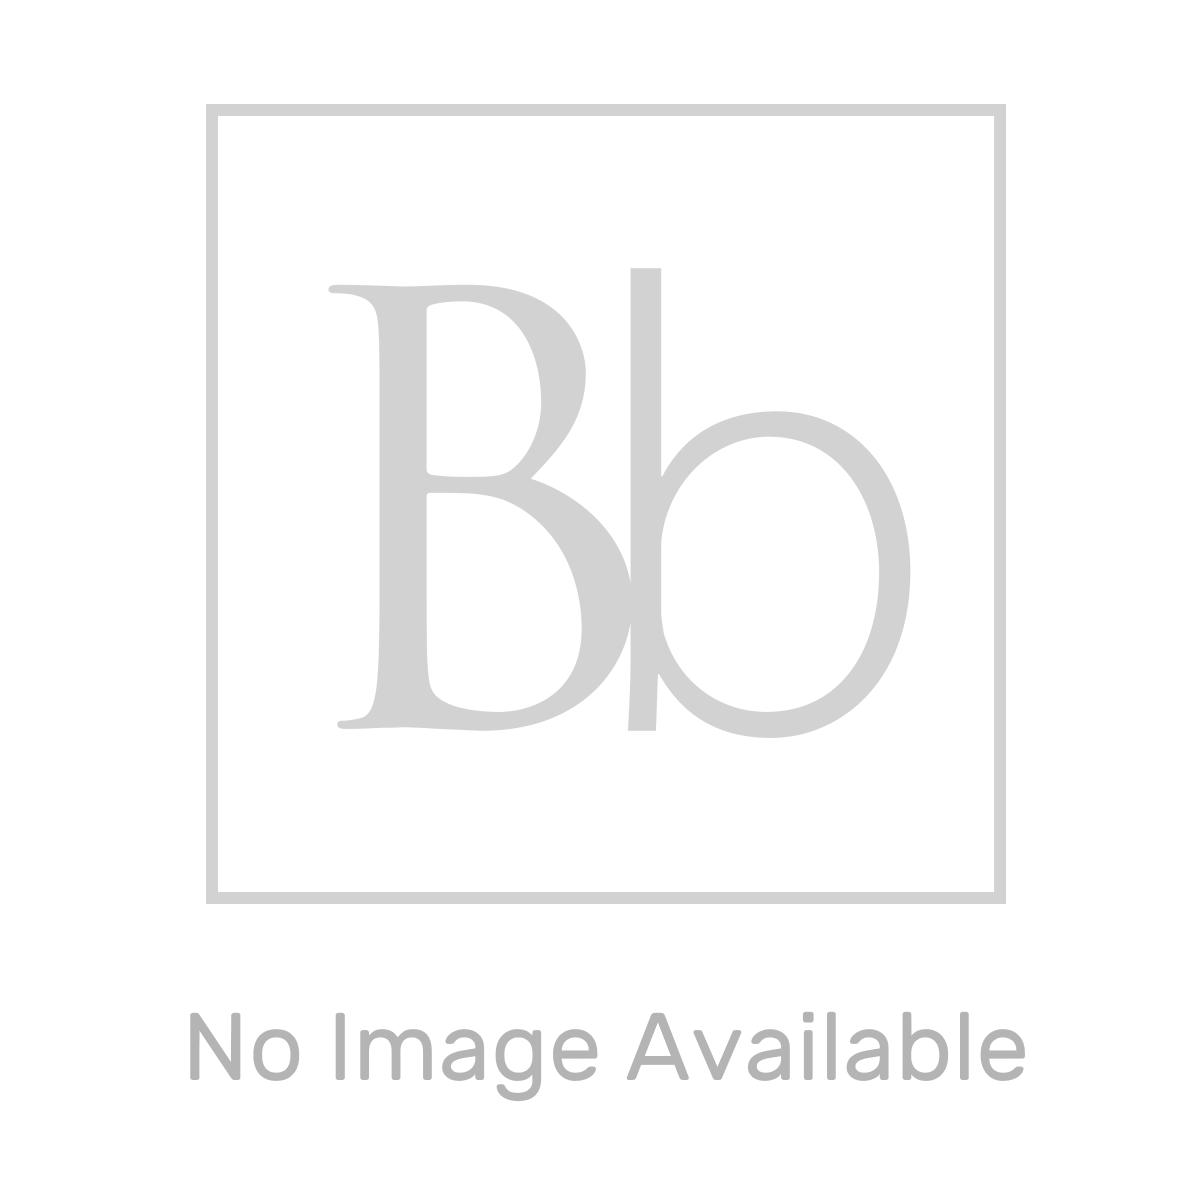 RAK Sensation Gloss White 1 Tap Hole Wall Hung Basin 550mm Measurements